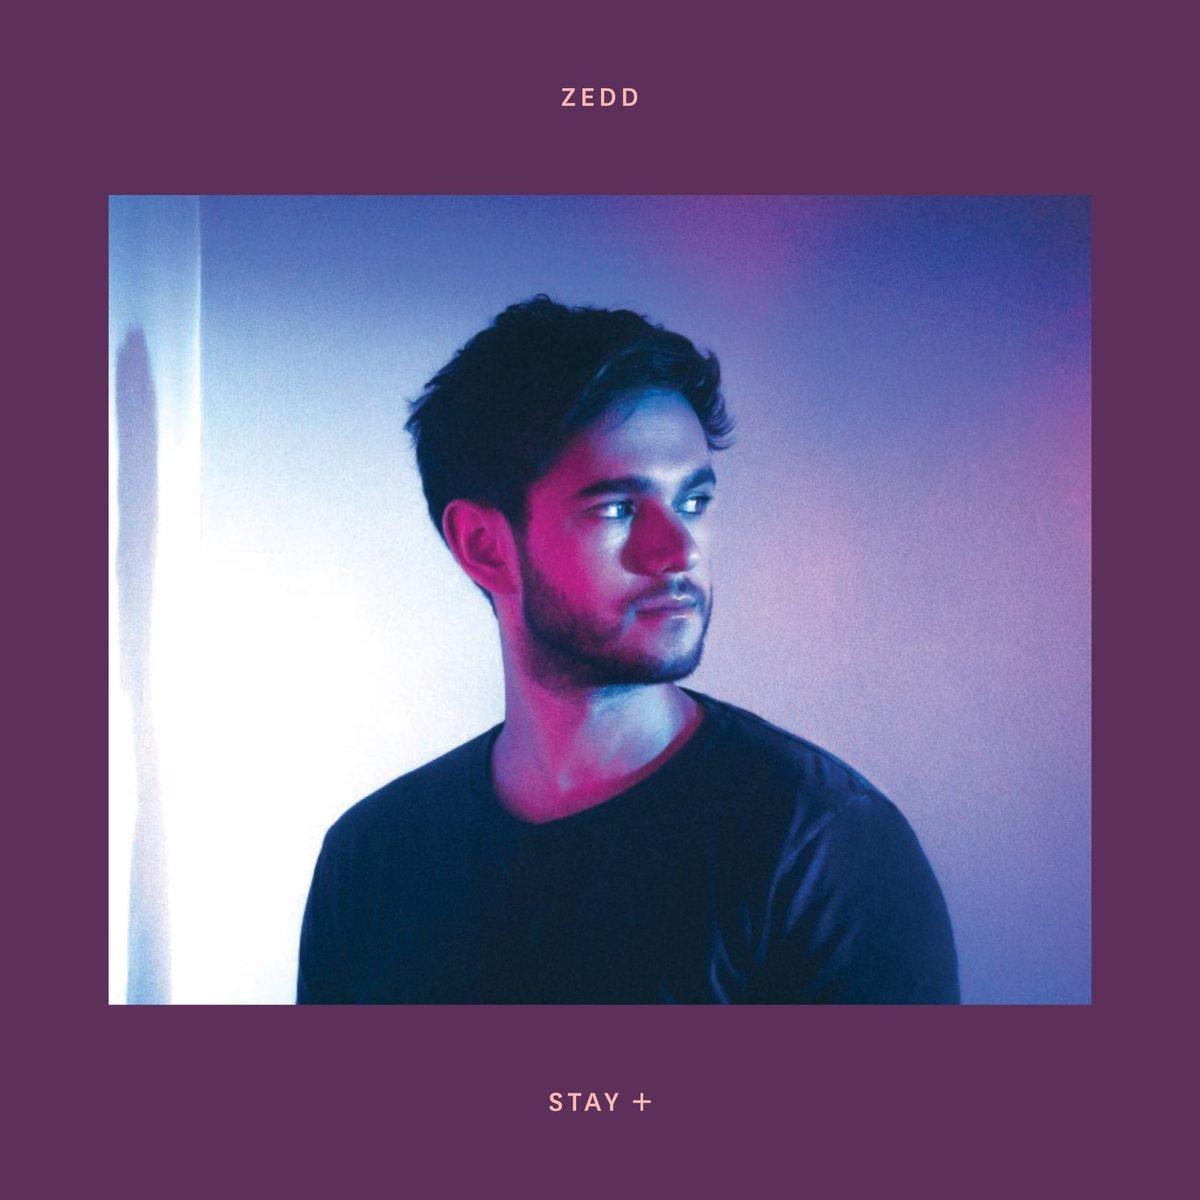 ZEDD STAY - Album: Zedd - Stay +